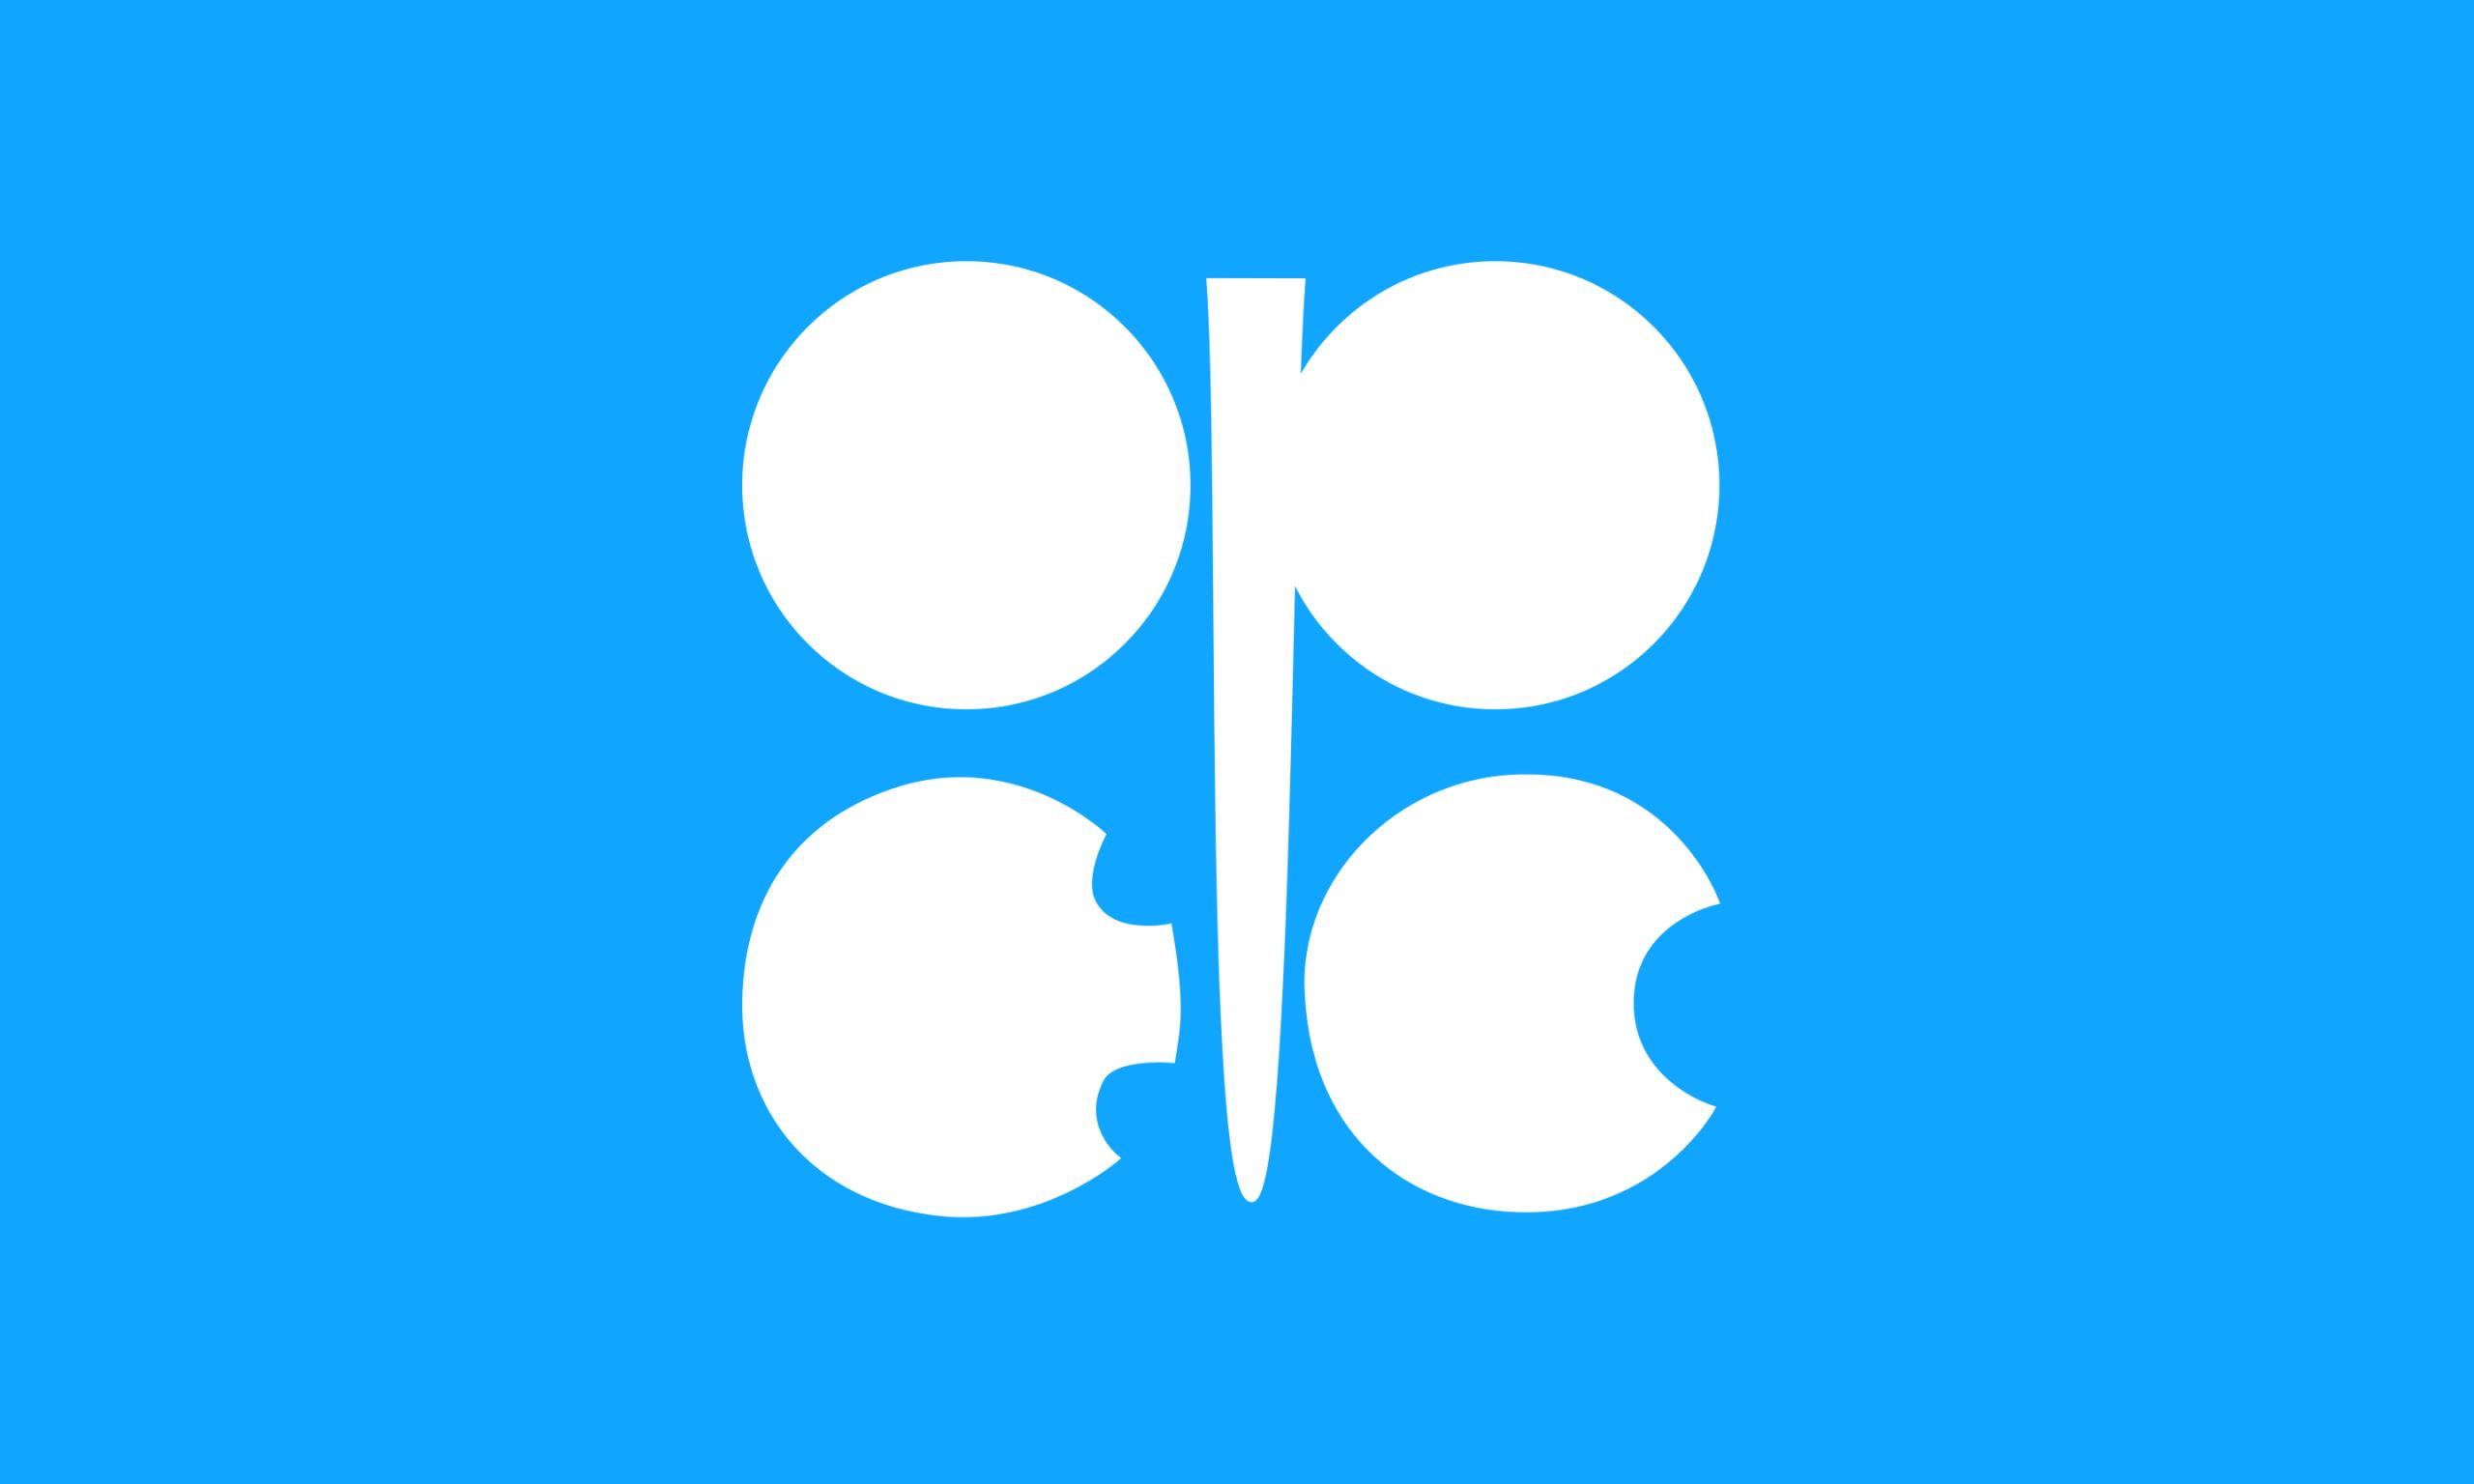 Das OPEC-Logo